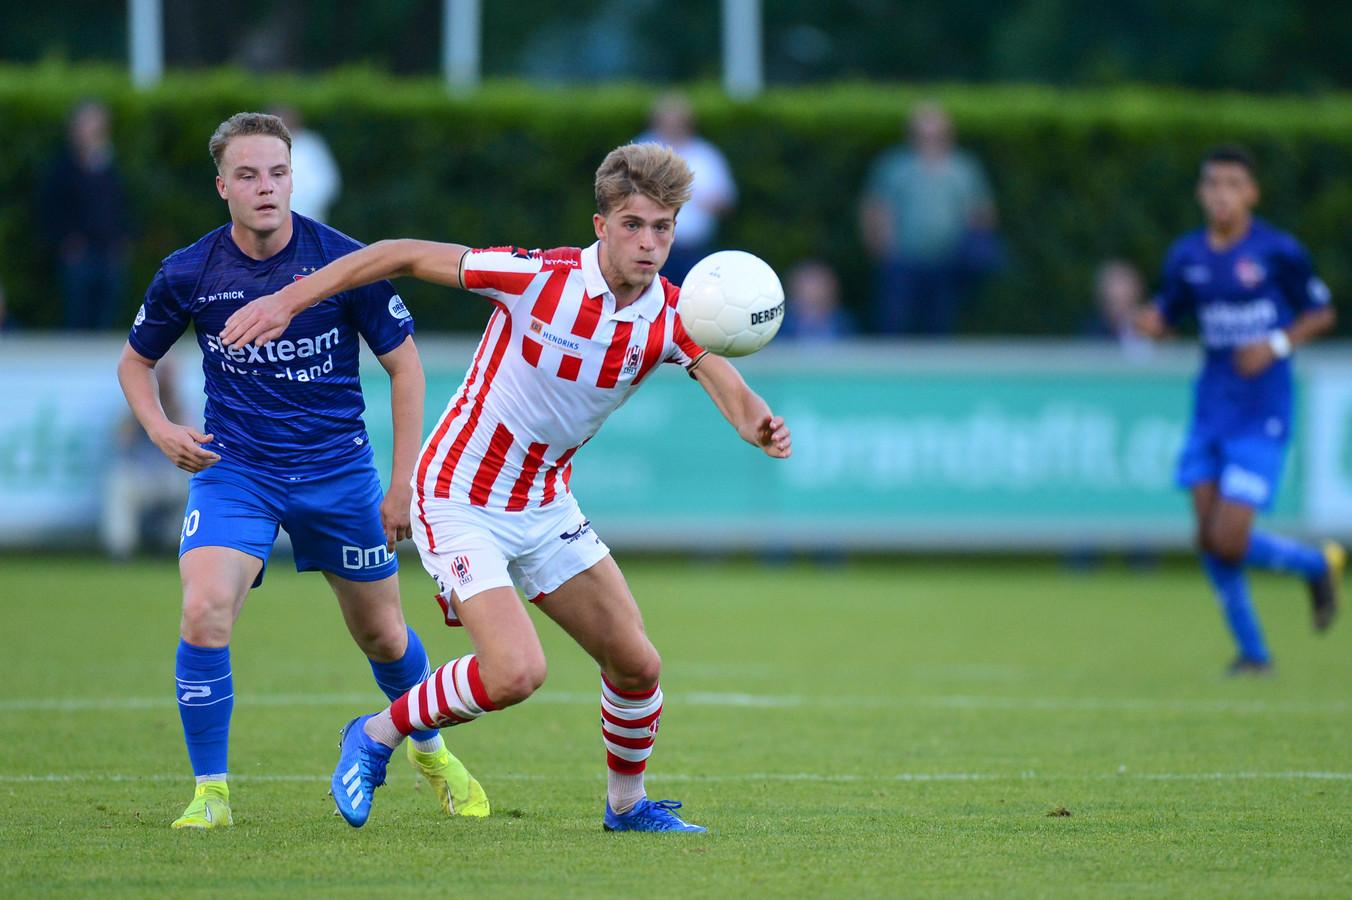 De Treffers begint op 5 september in Groesbeek tegen HHC.